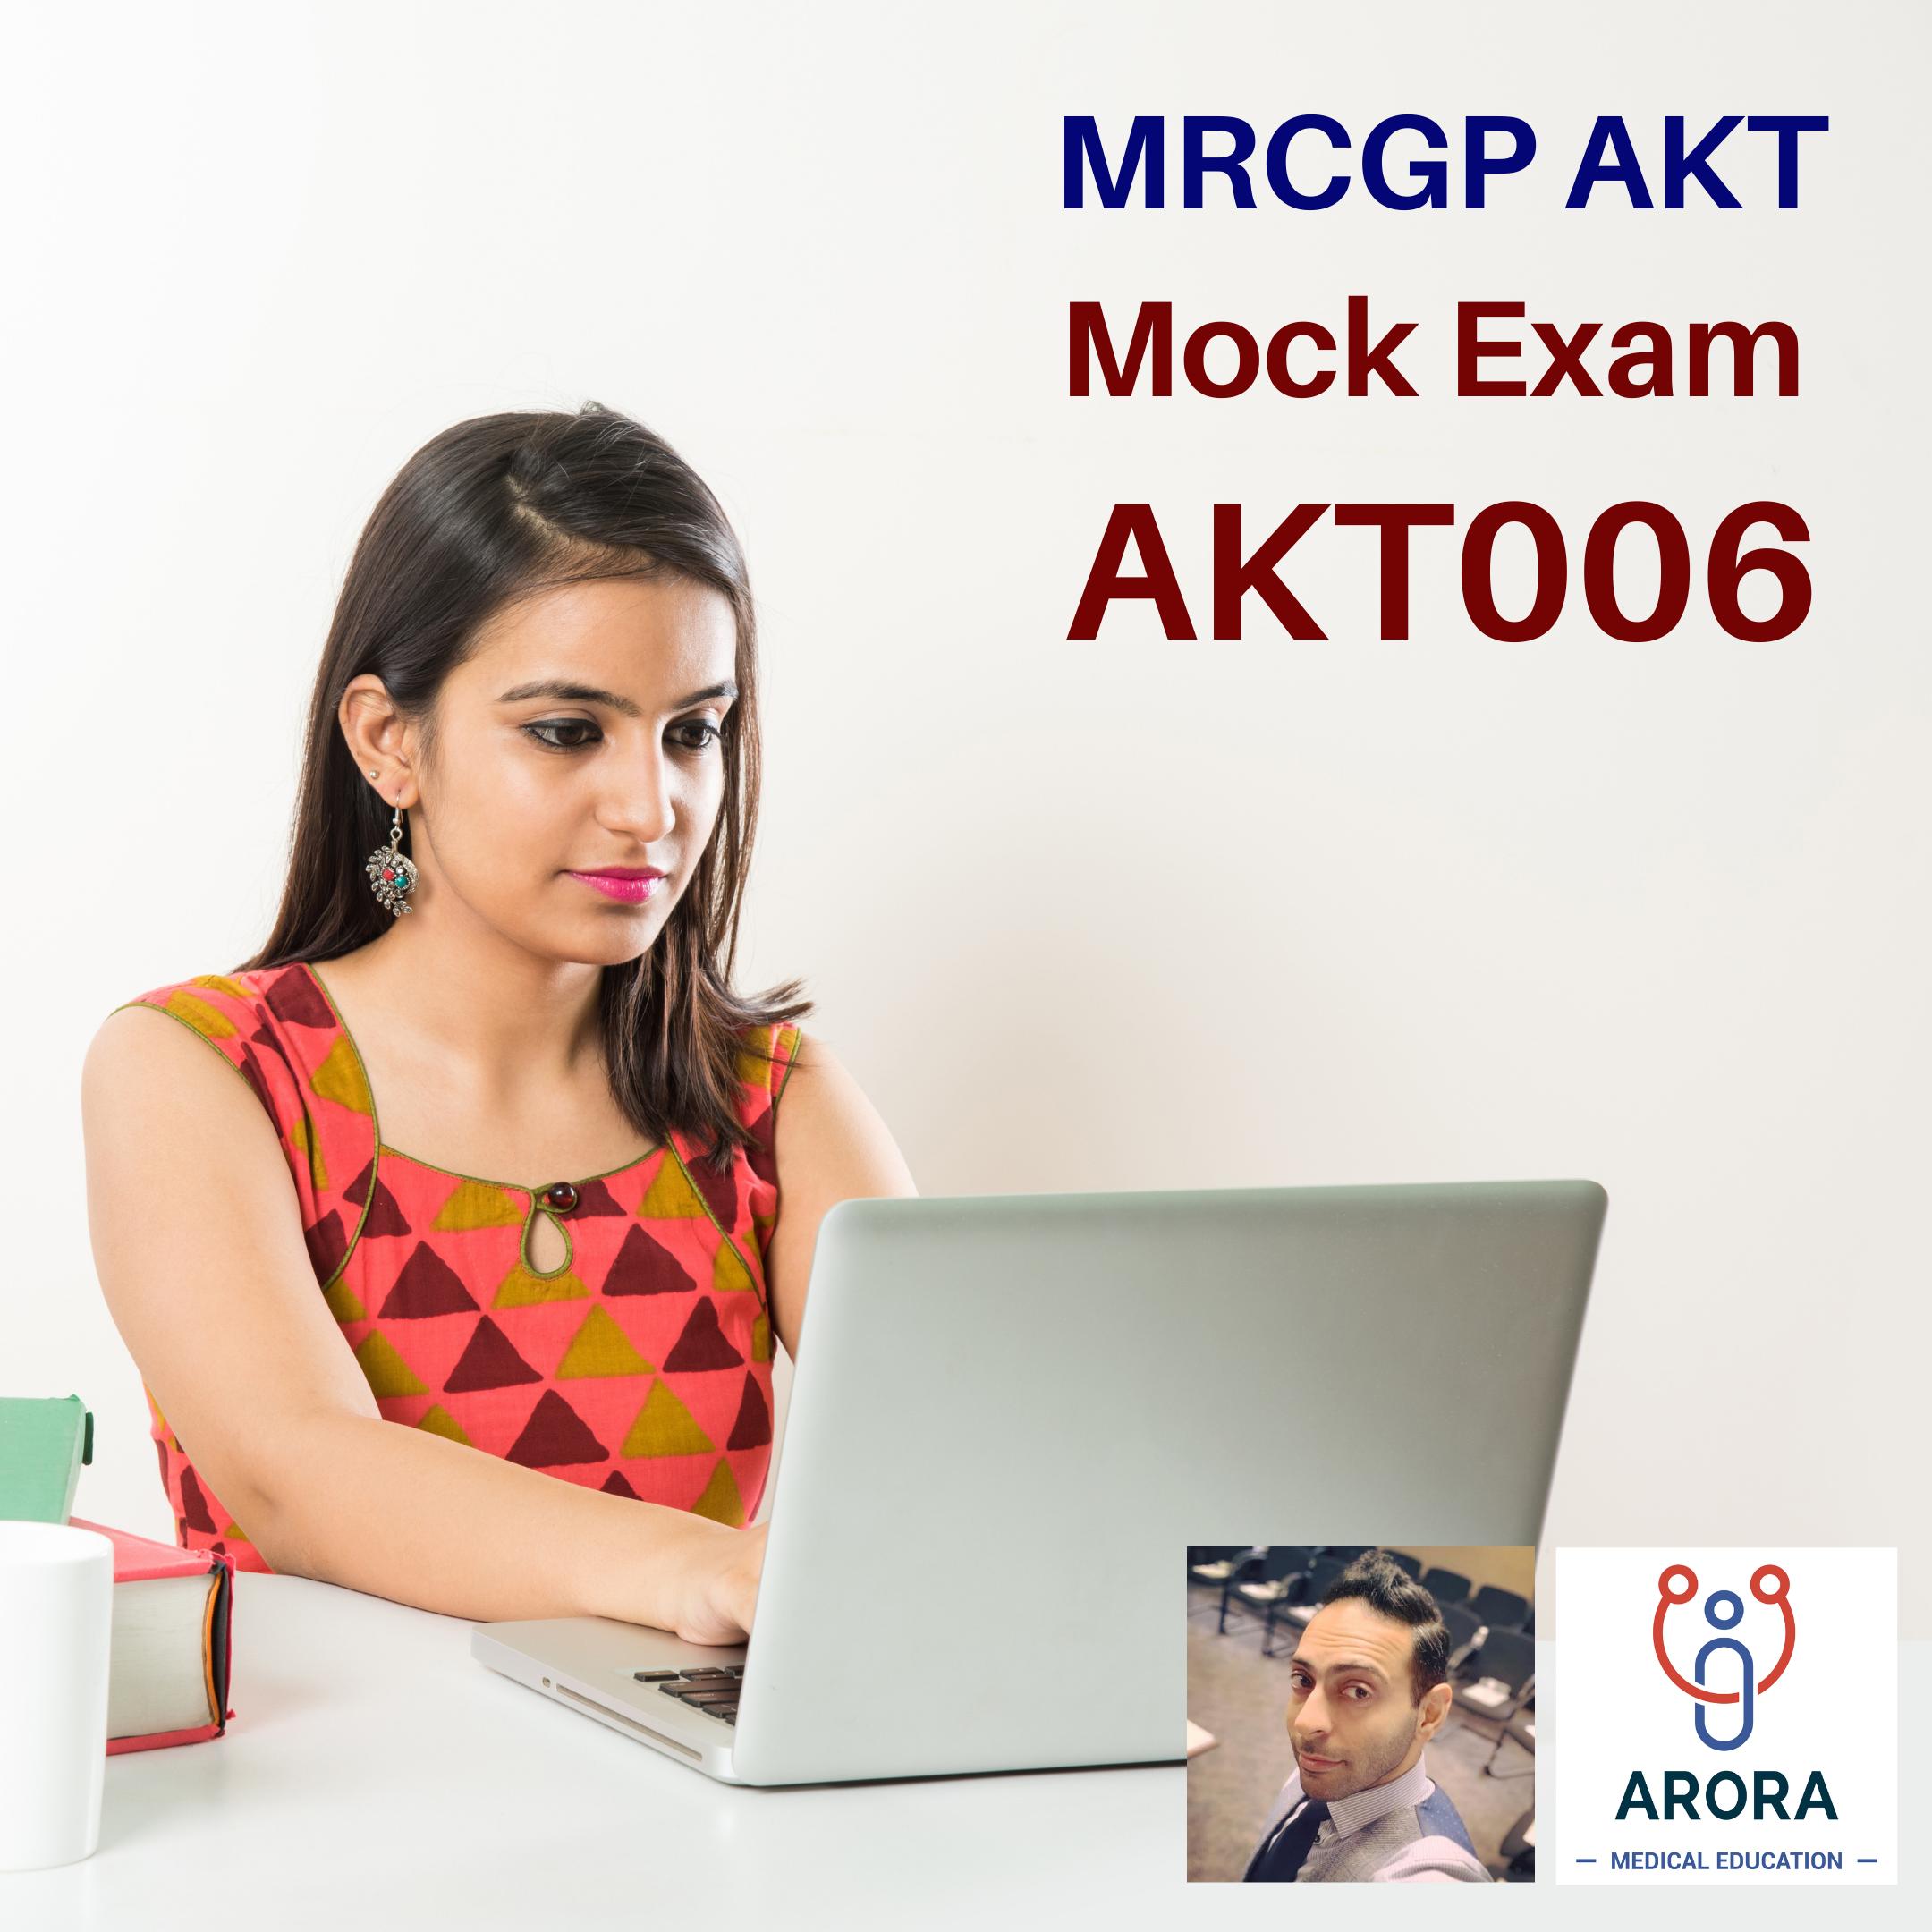 AKT006 Pic - MRCGP CSA, AKT and PLAB Exam Courses and Online Webinars - Arora Medical Education